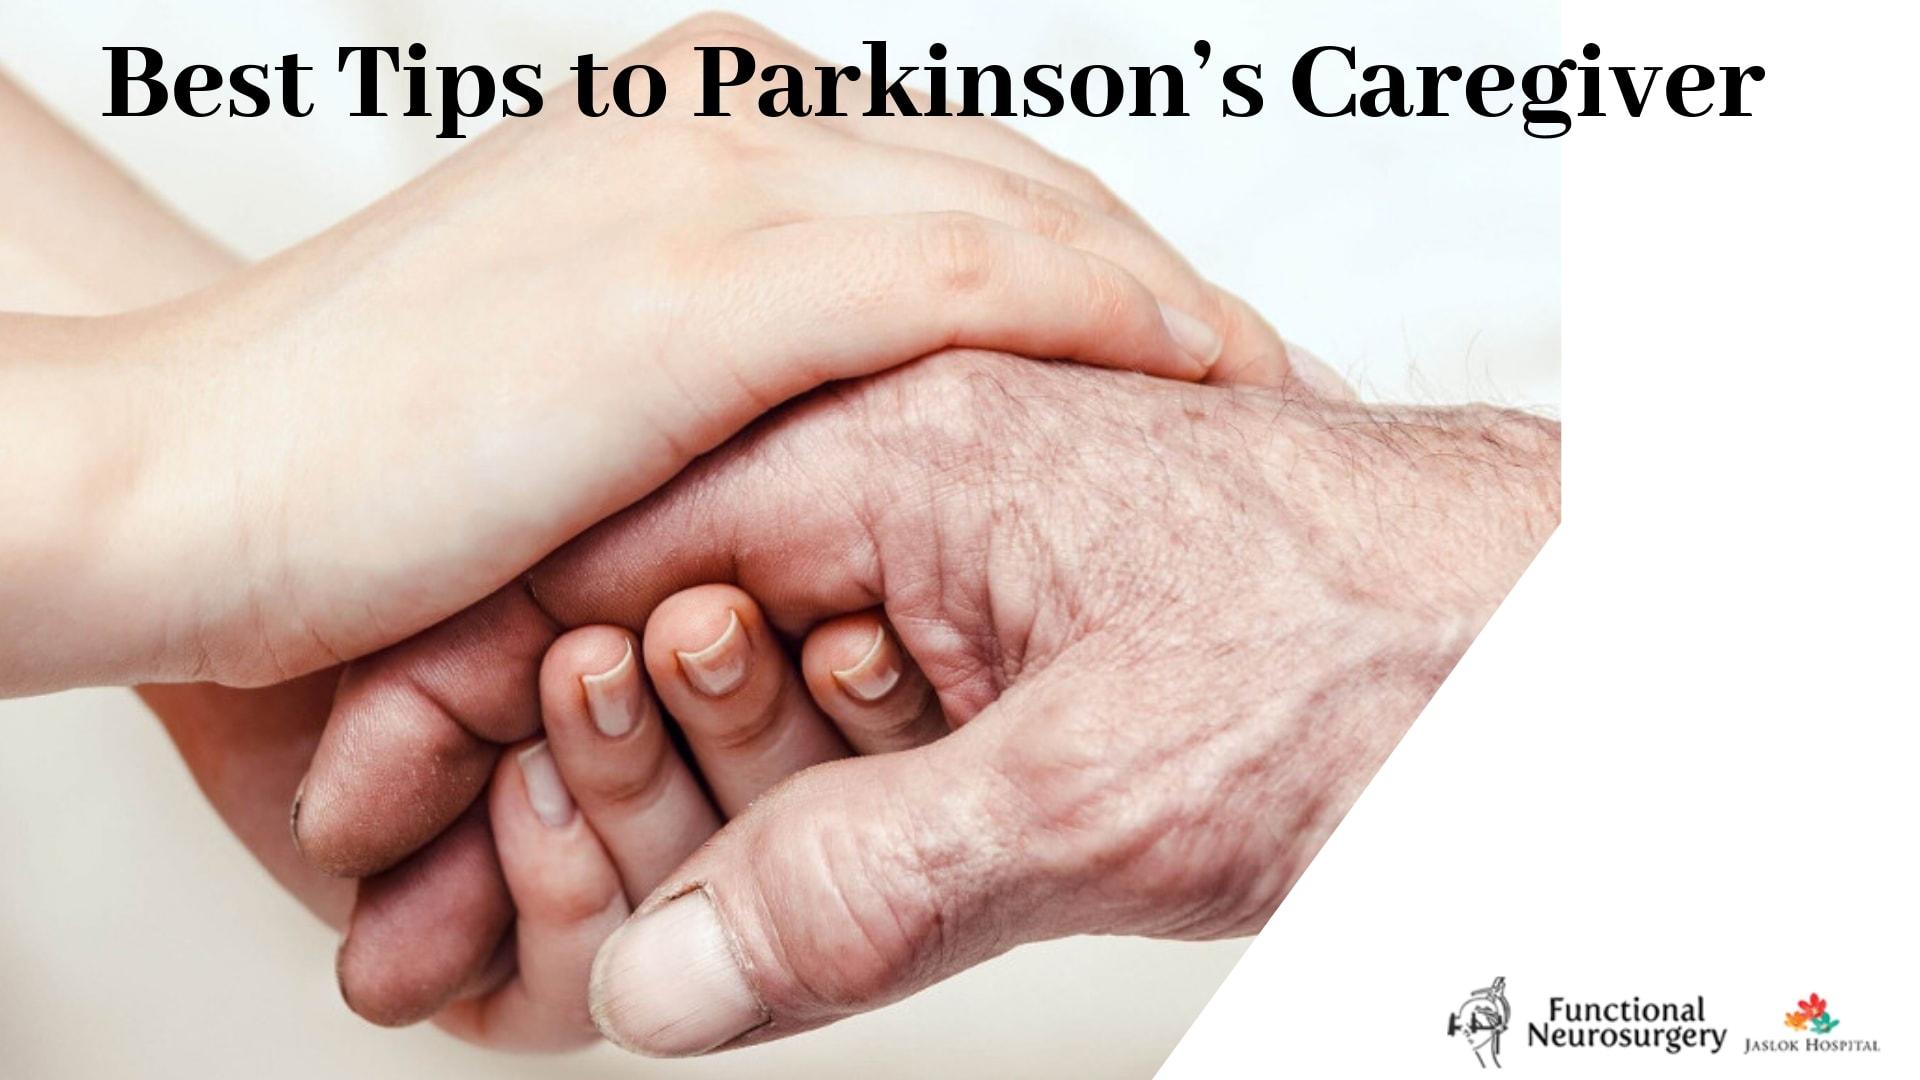 Best Tips to Parkinson's Caregiver